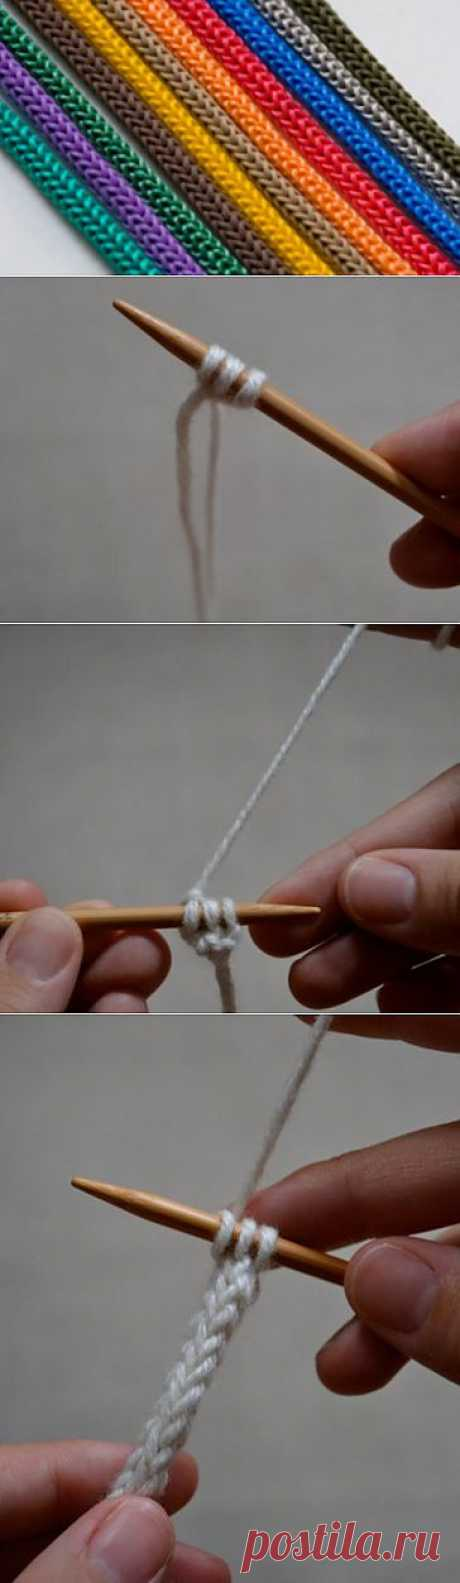 Как вязать шнур спицами